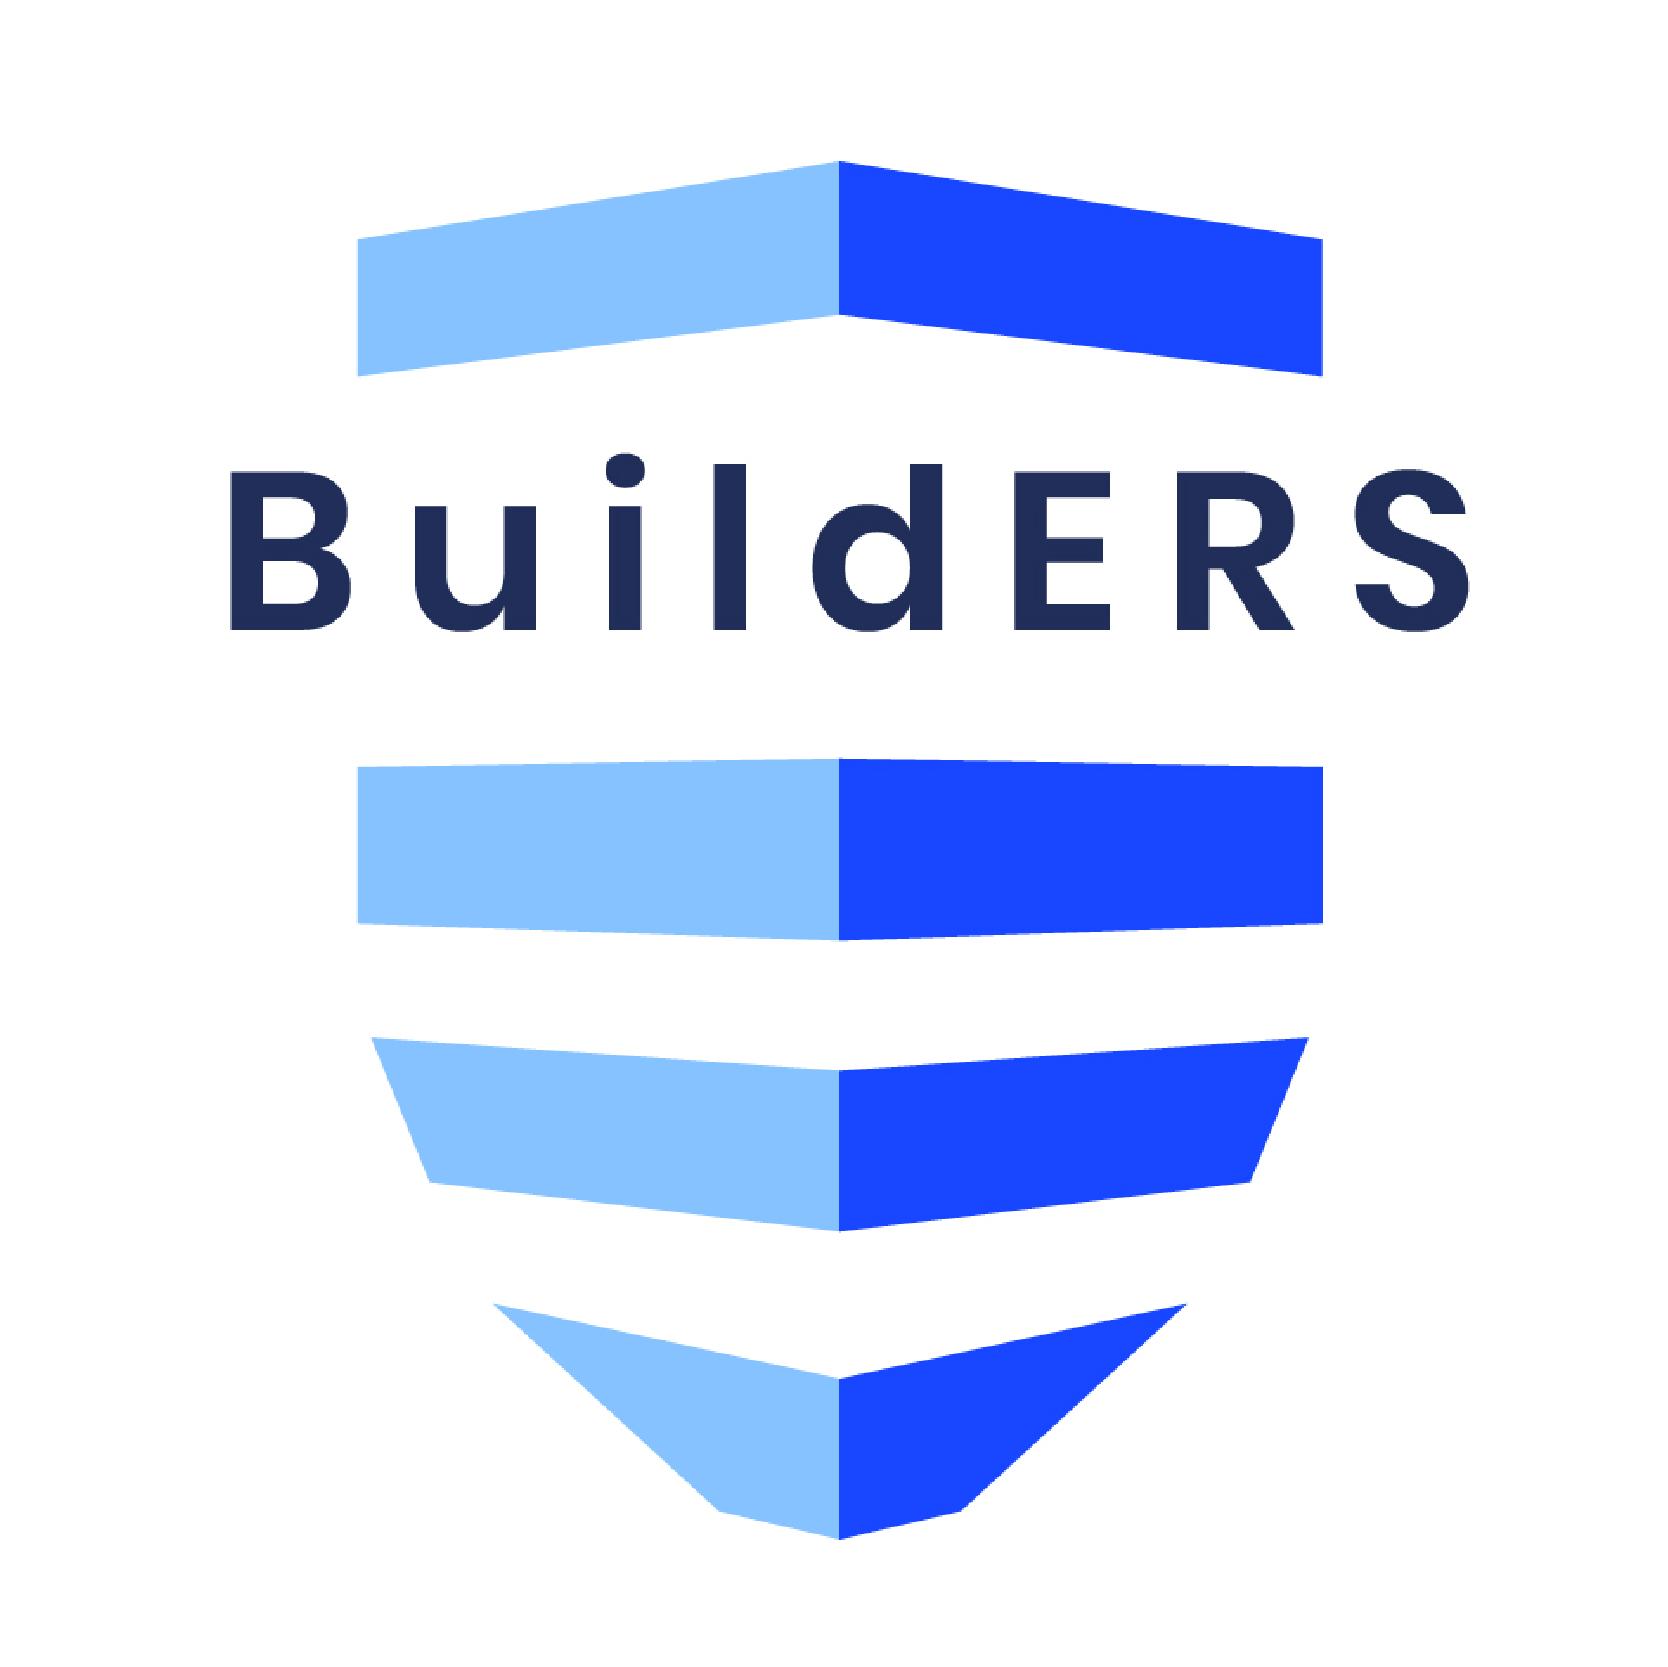 logo of case study partner